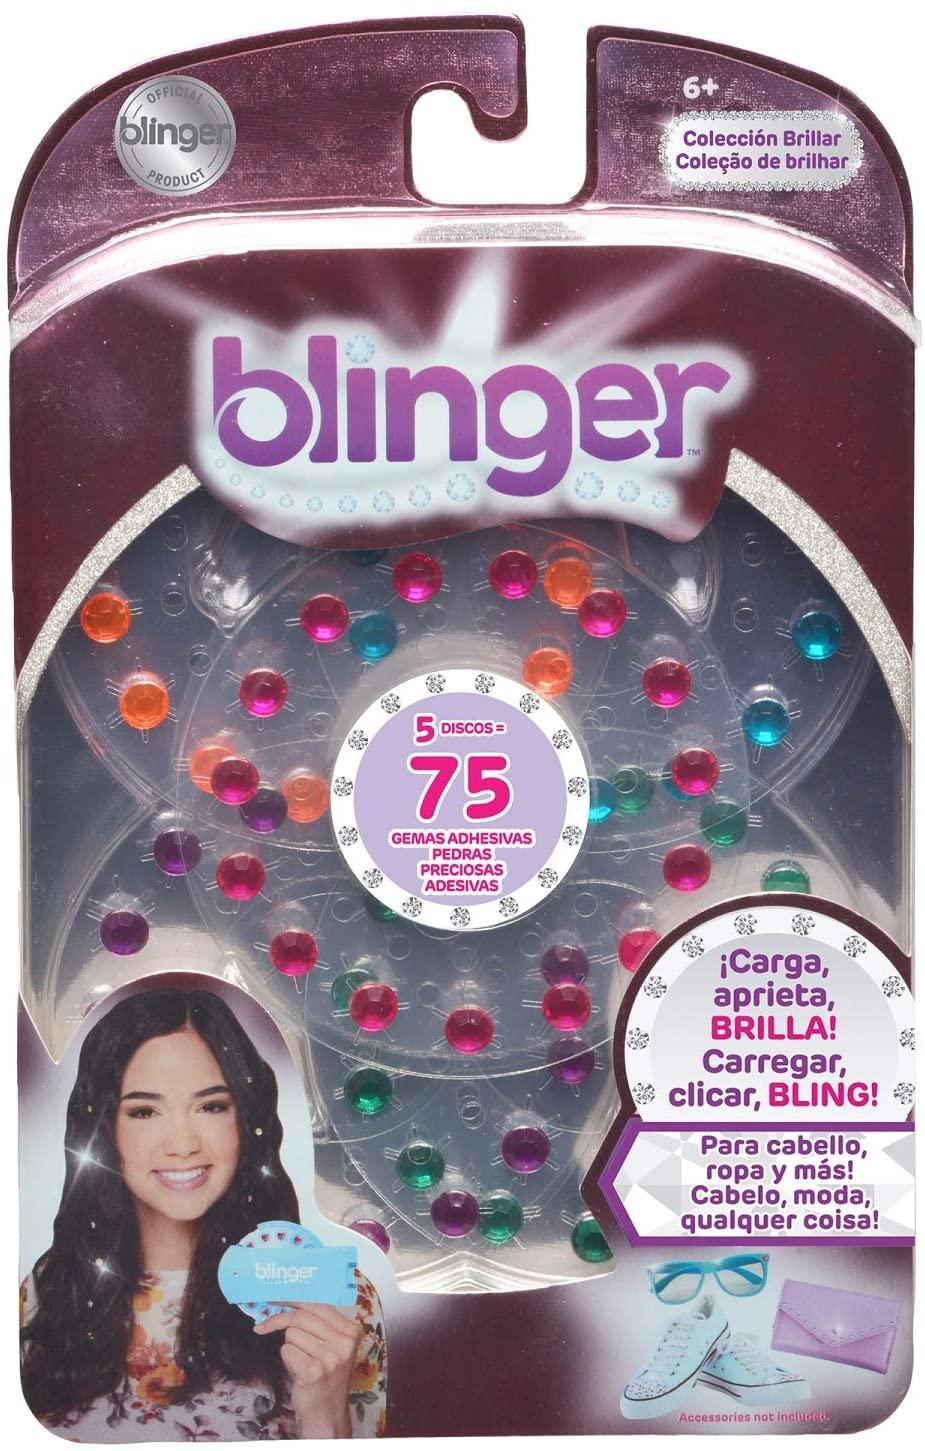 Blinger – Artistic Games Replica Rainbow Pack, Multicolour (Bizak 63228504_3)